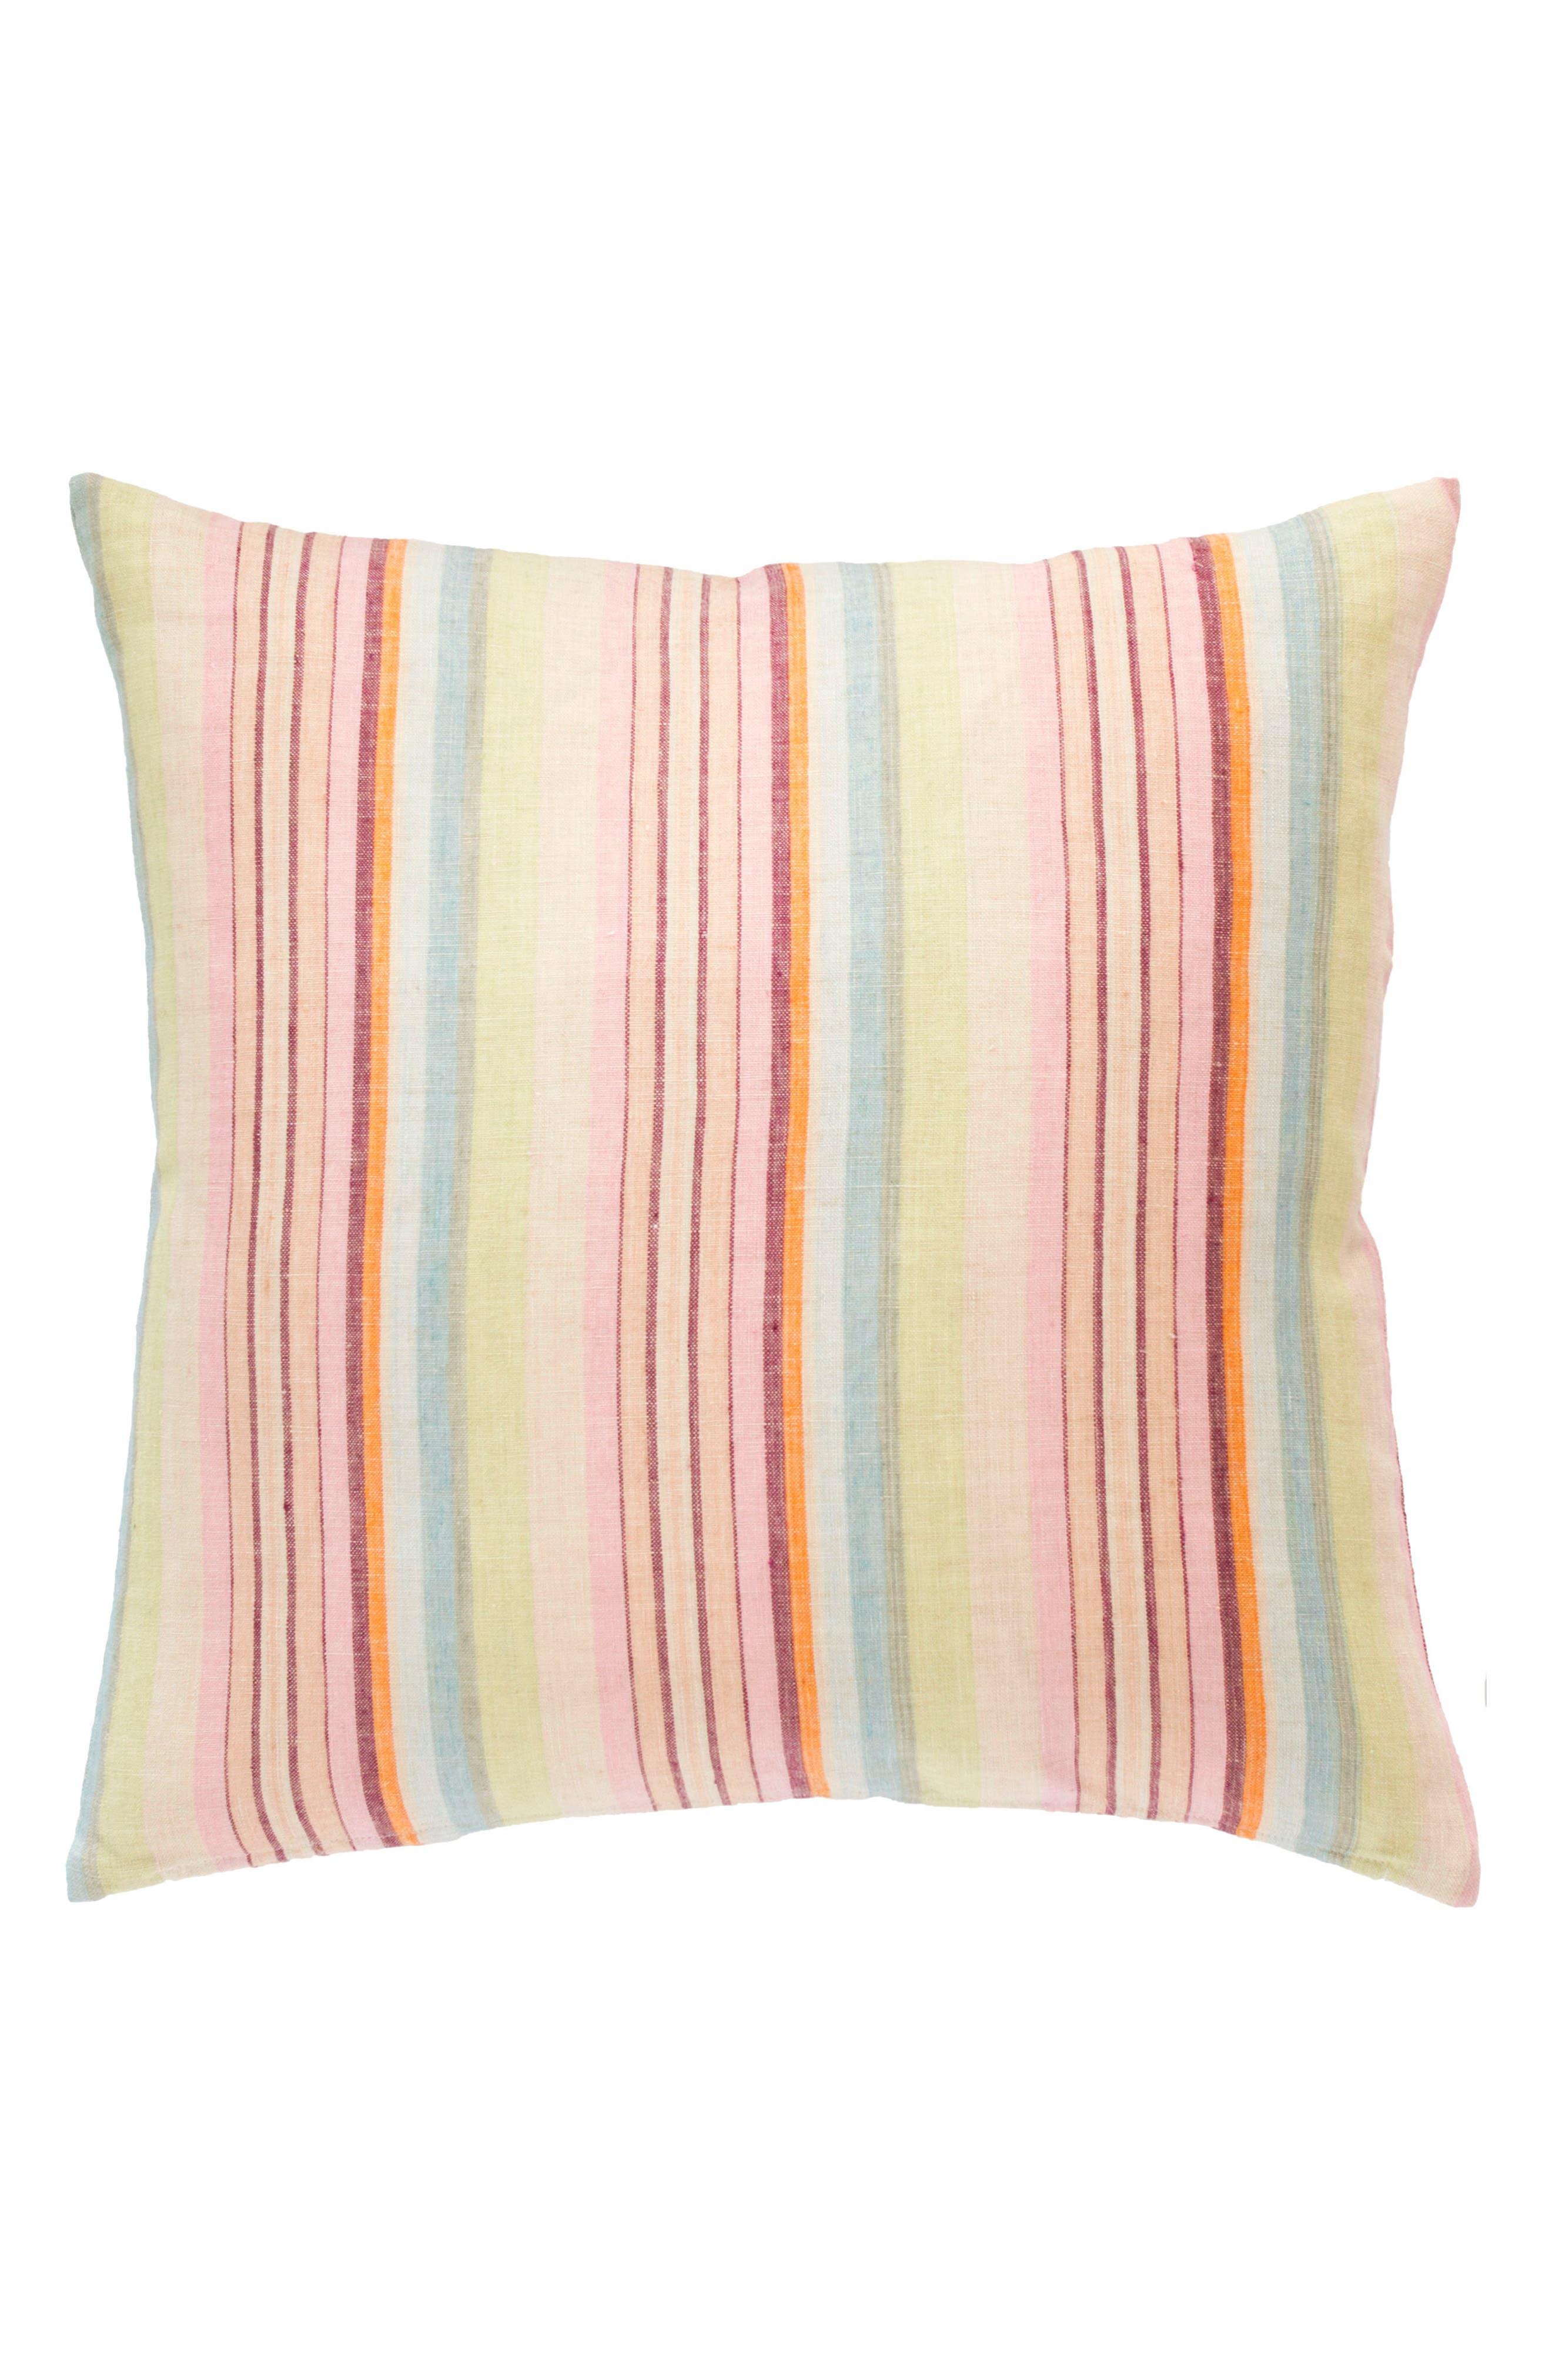 Savona Stripe Linen Accent Pillow,                         Main,                         color, PINK